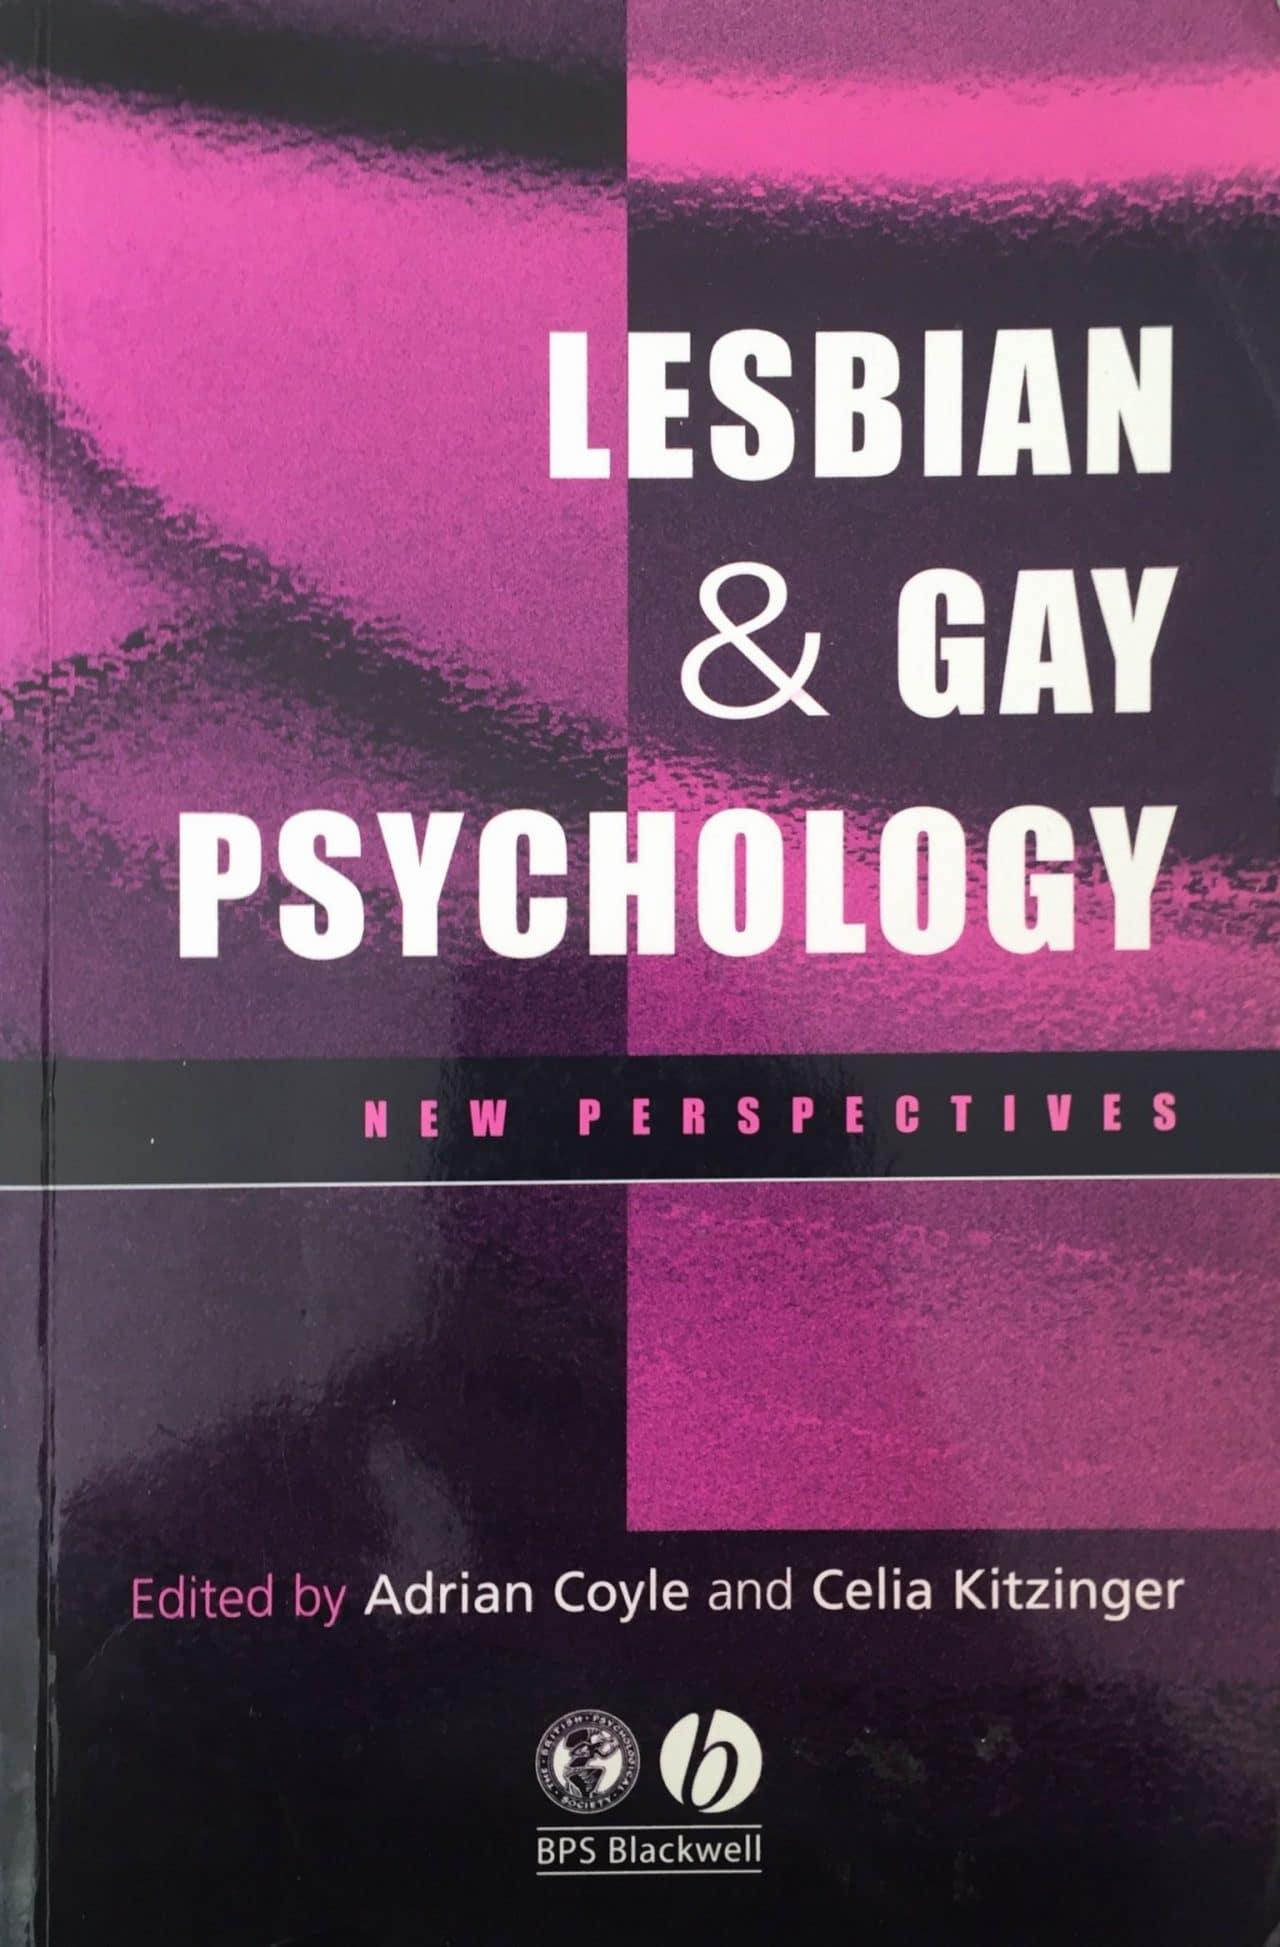 LESBIAN AND GAY PSYCHOLOGY